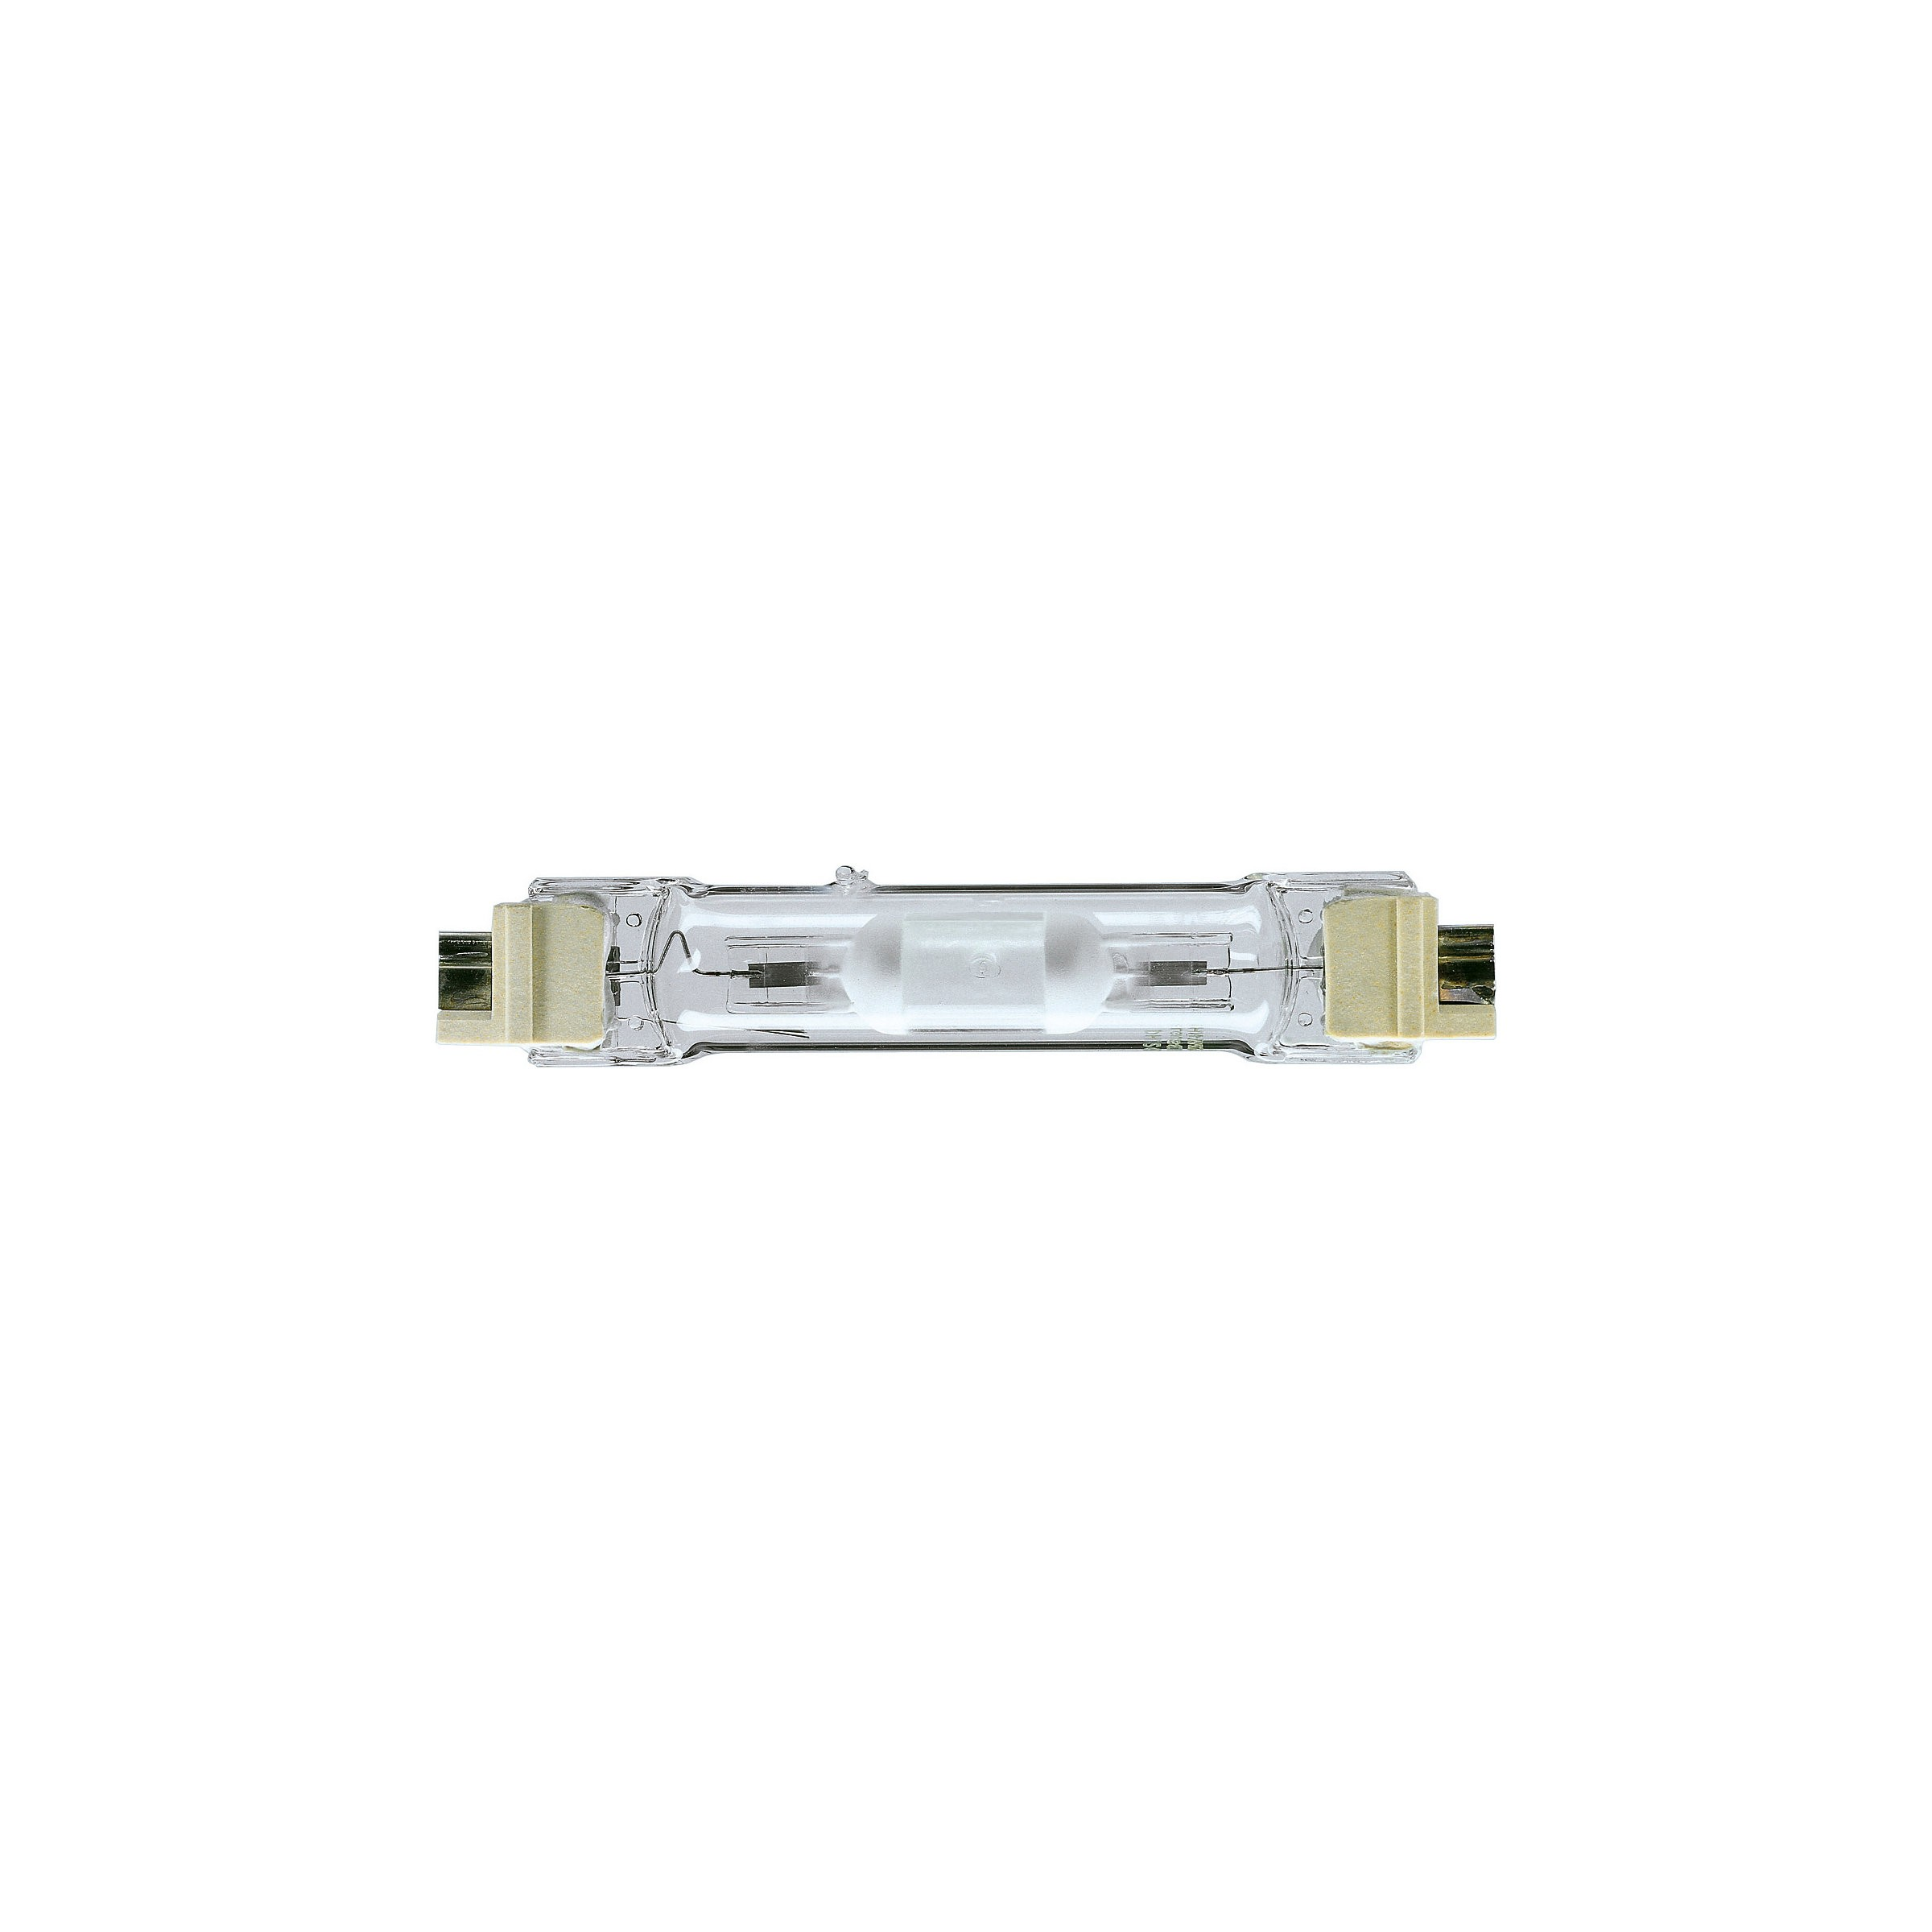 Phillips 250MHNTD FC2 250W Metal Halide Lamp - Buy online or in store from John Cribb & Sons Ltd